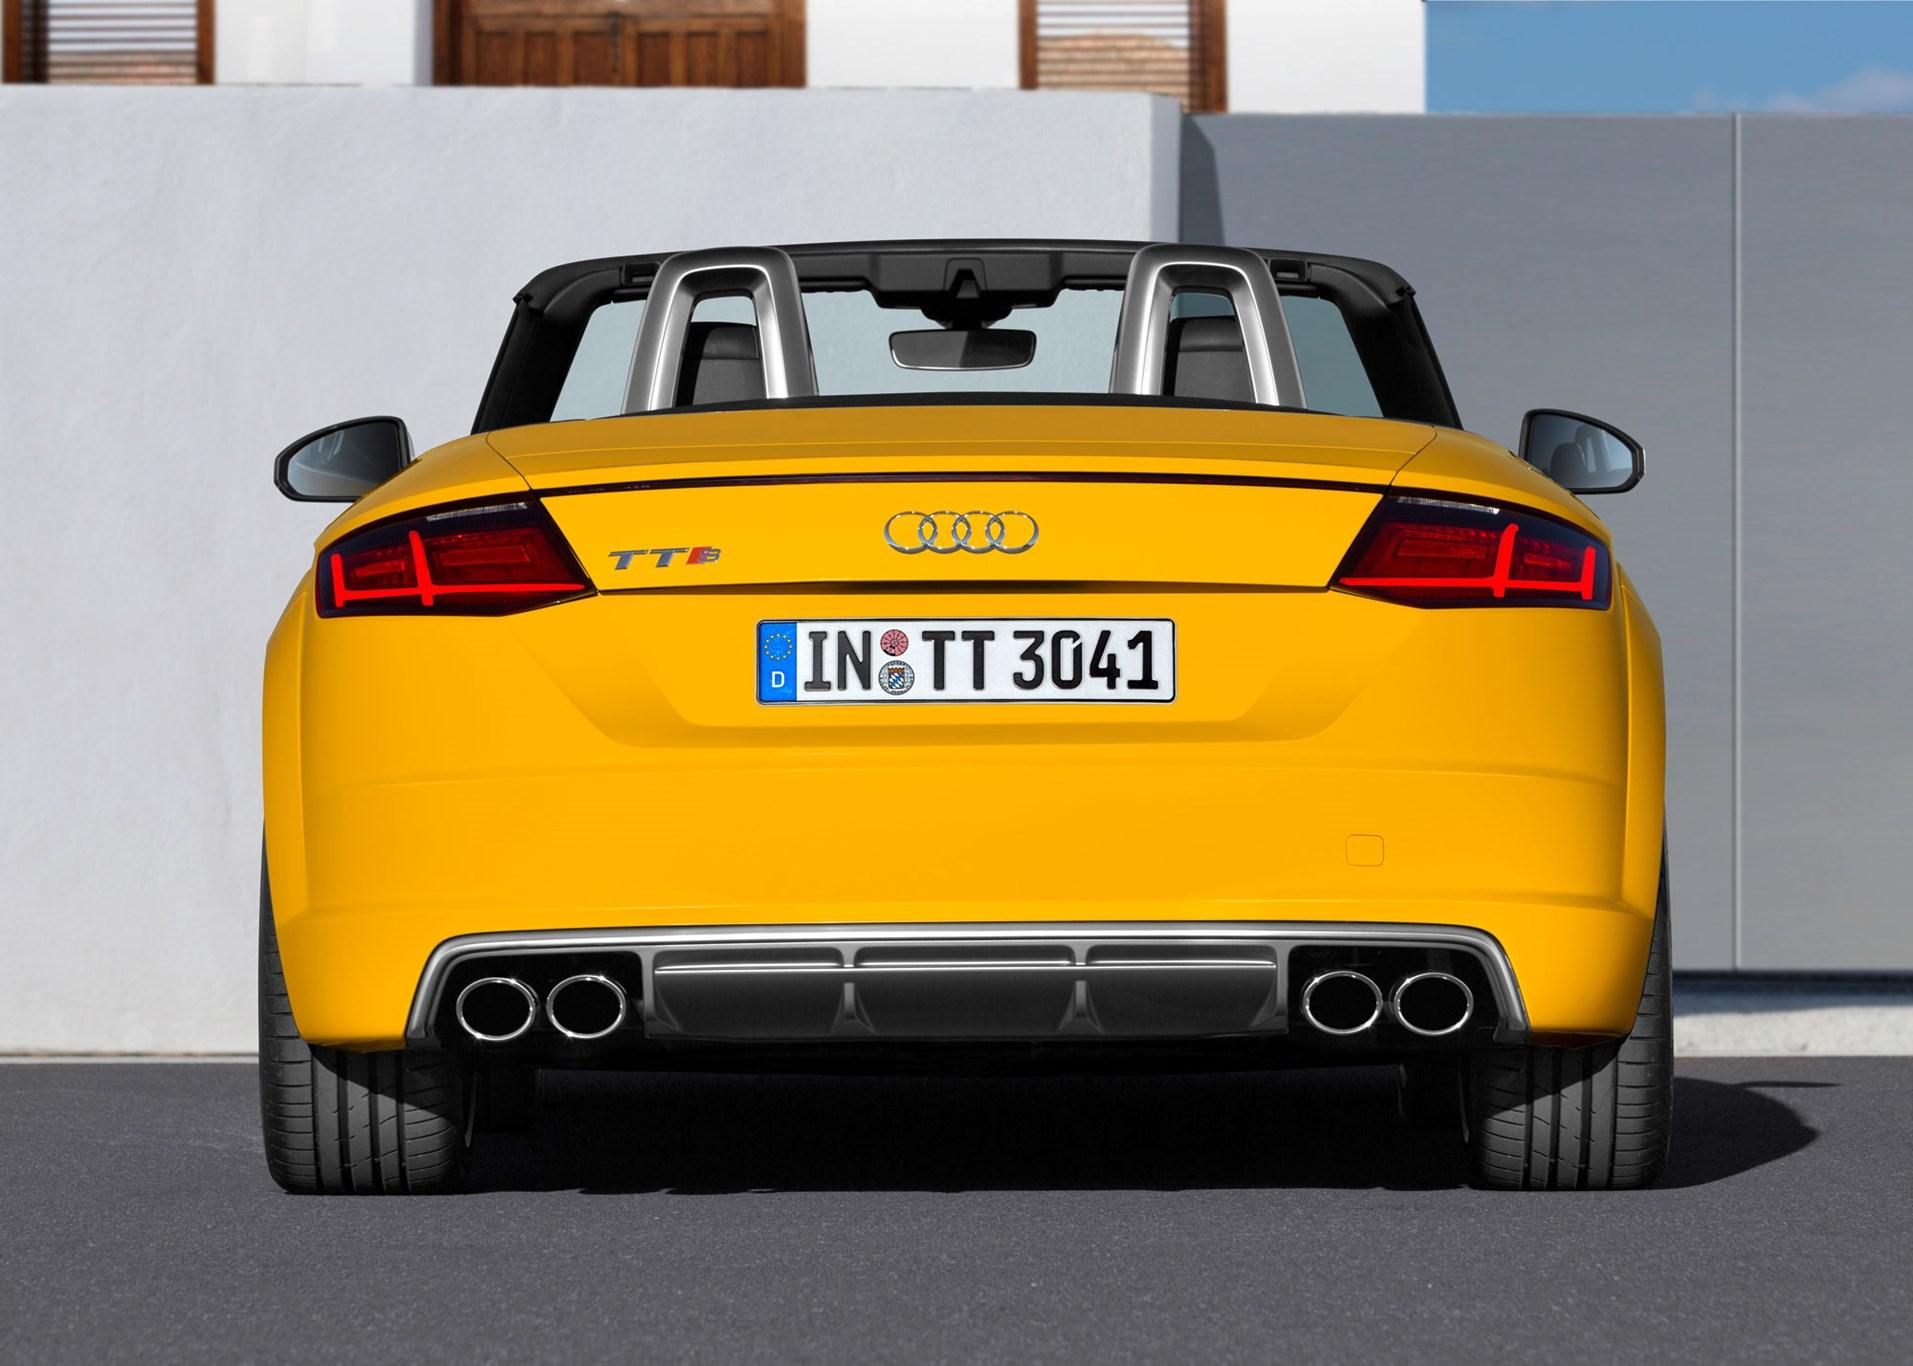 Audi Tts Roadster 2015 Review Car Magazine 2000 Tt 225 Quattro Main Fuse Box Diagram A Rear Spoiler Extends Above 75mph